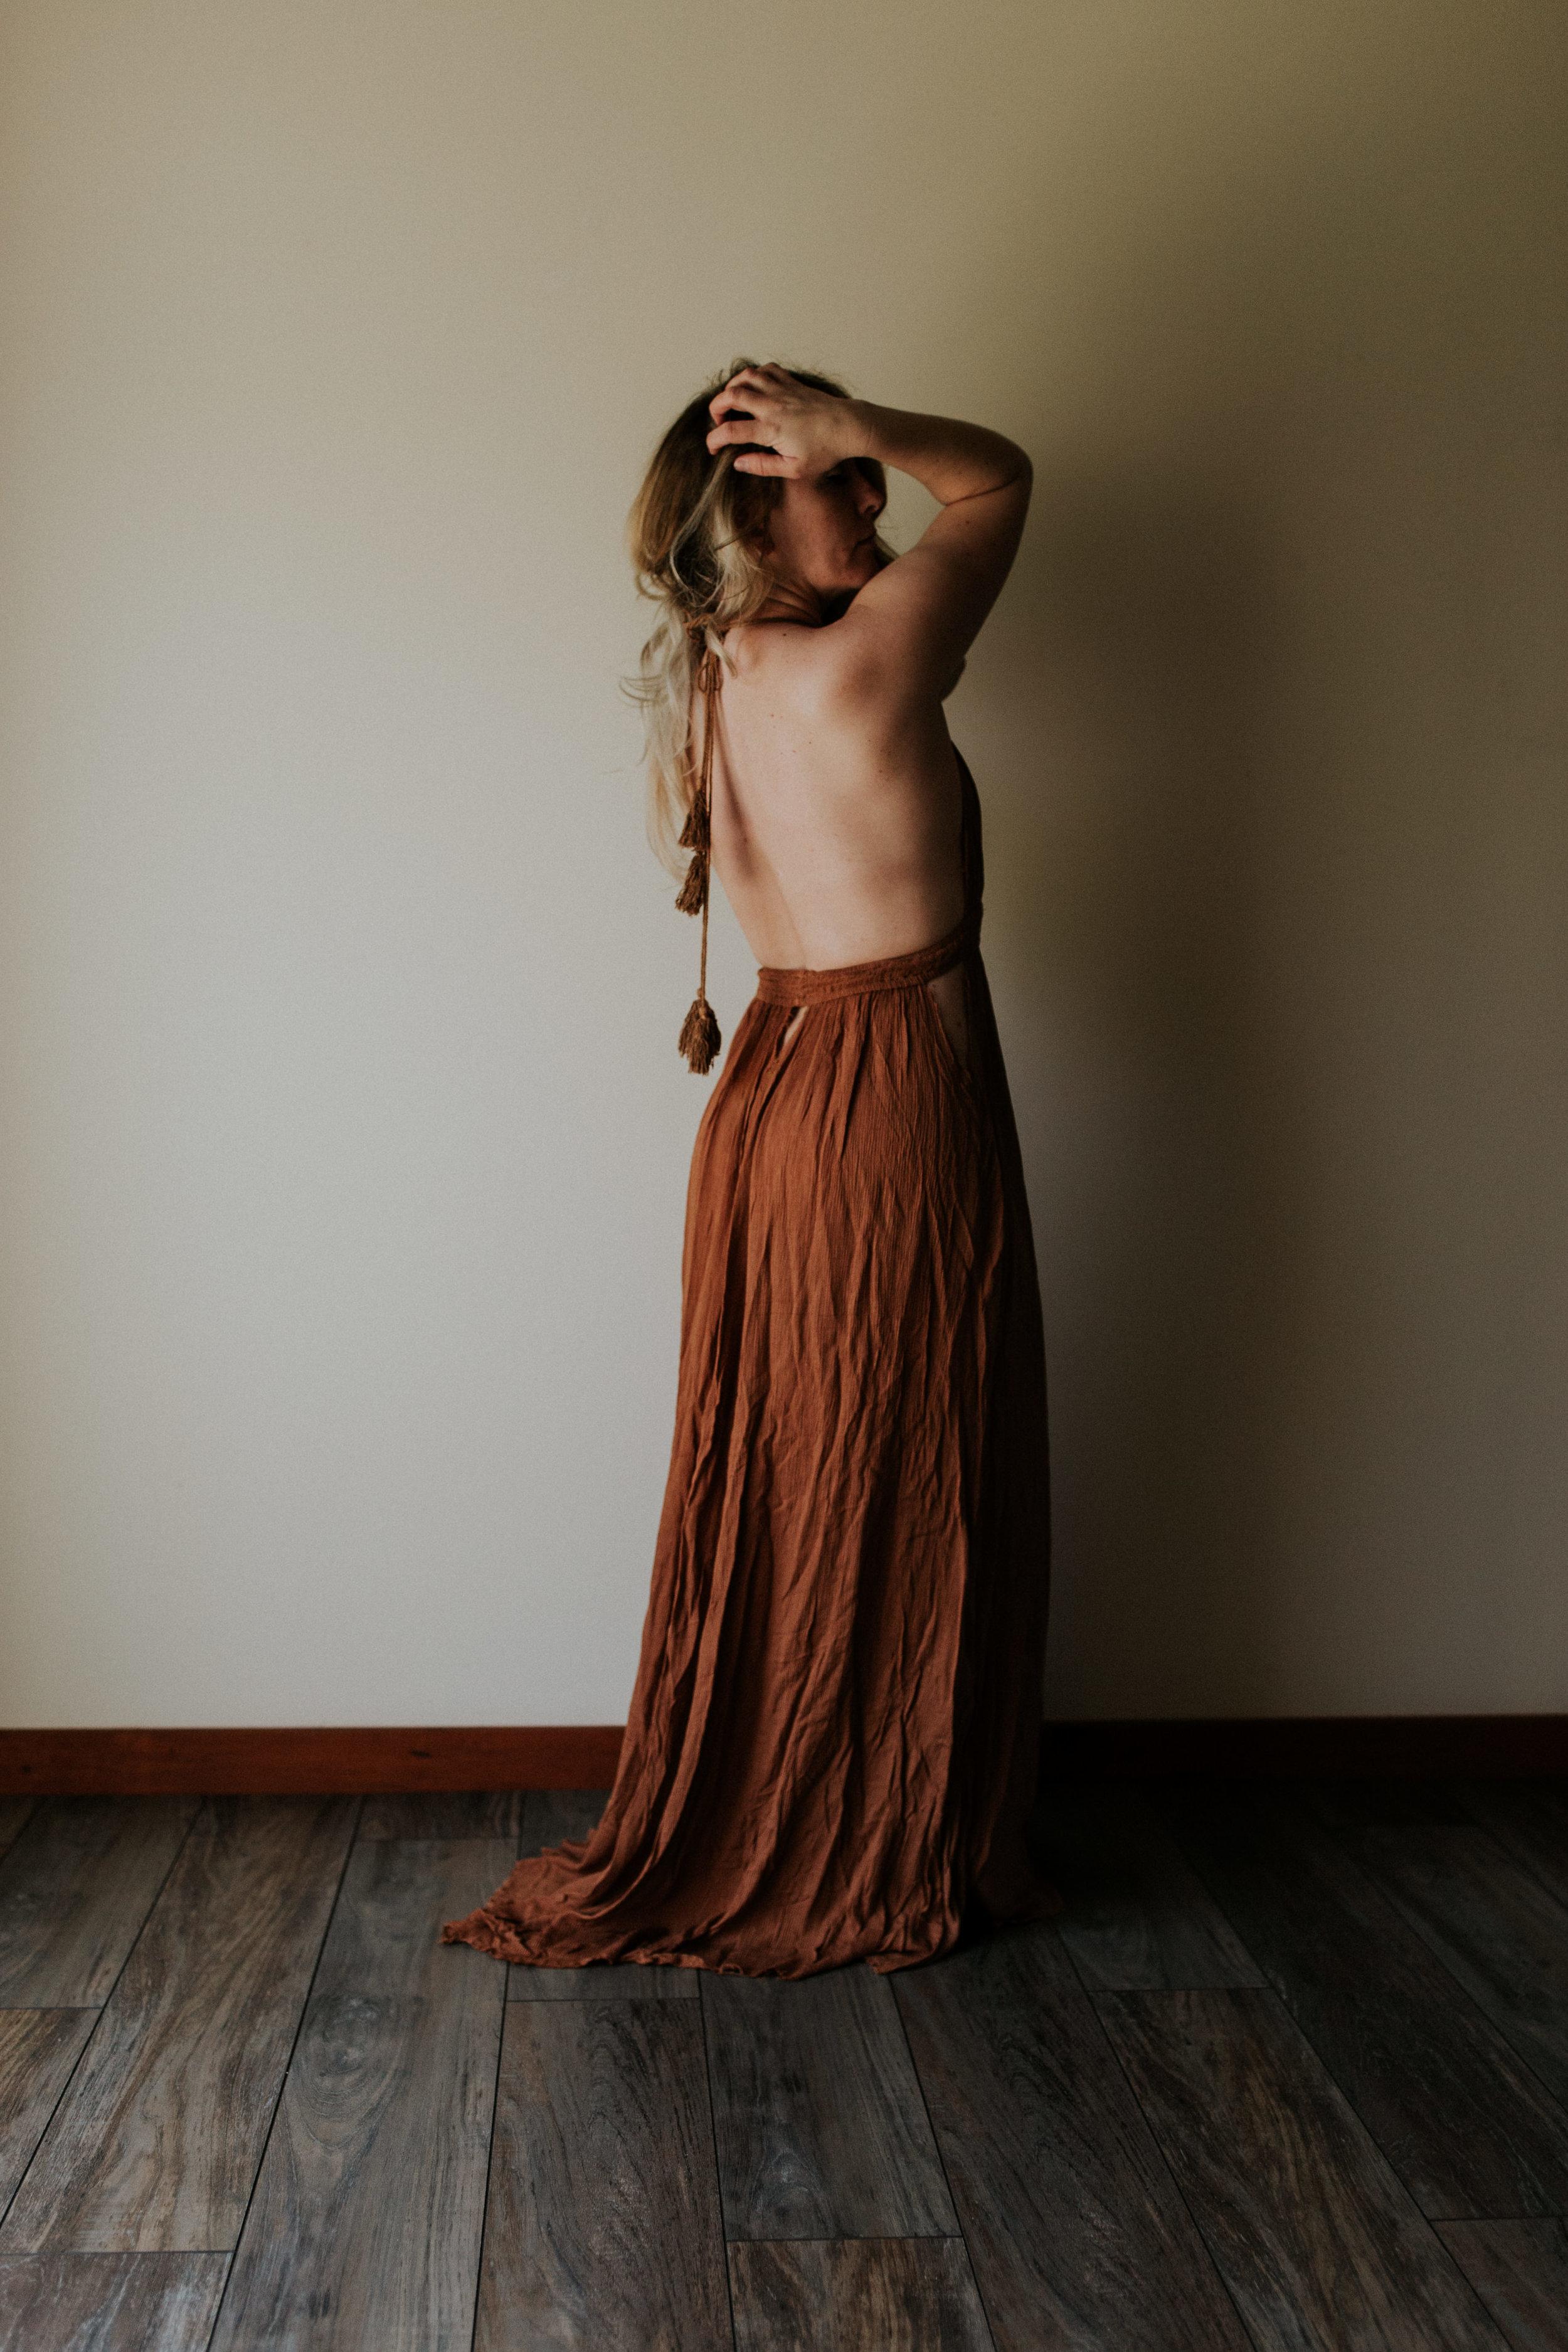 michigan-lifestyle-photographer-jessica-max-personal-work-9883.jpg